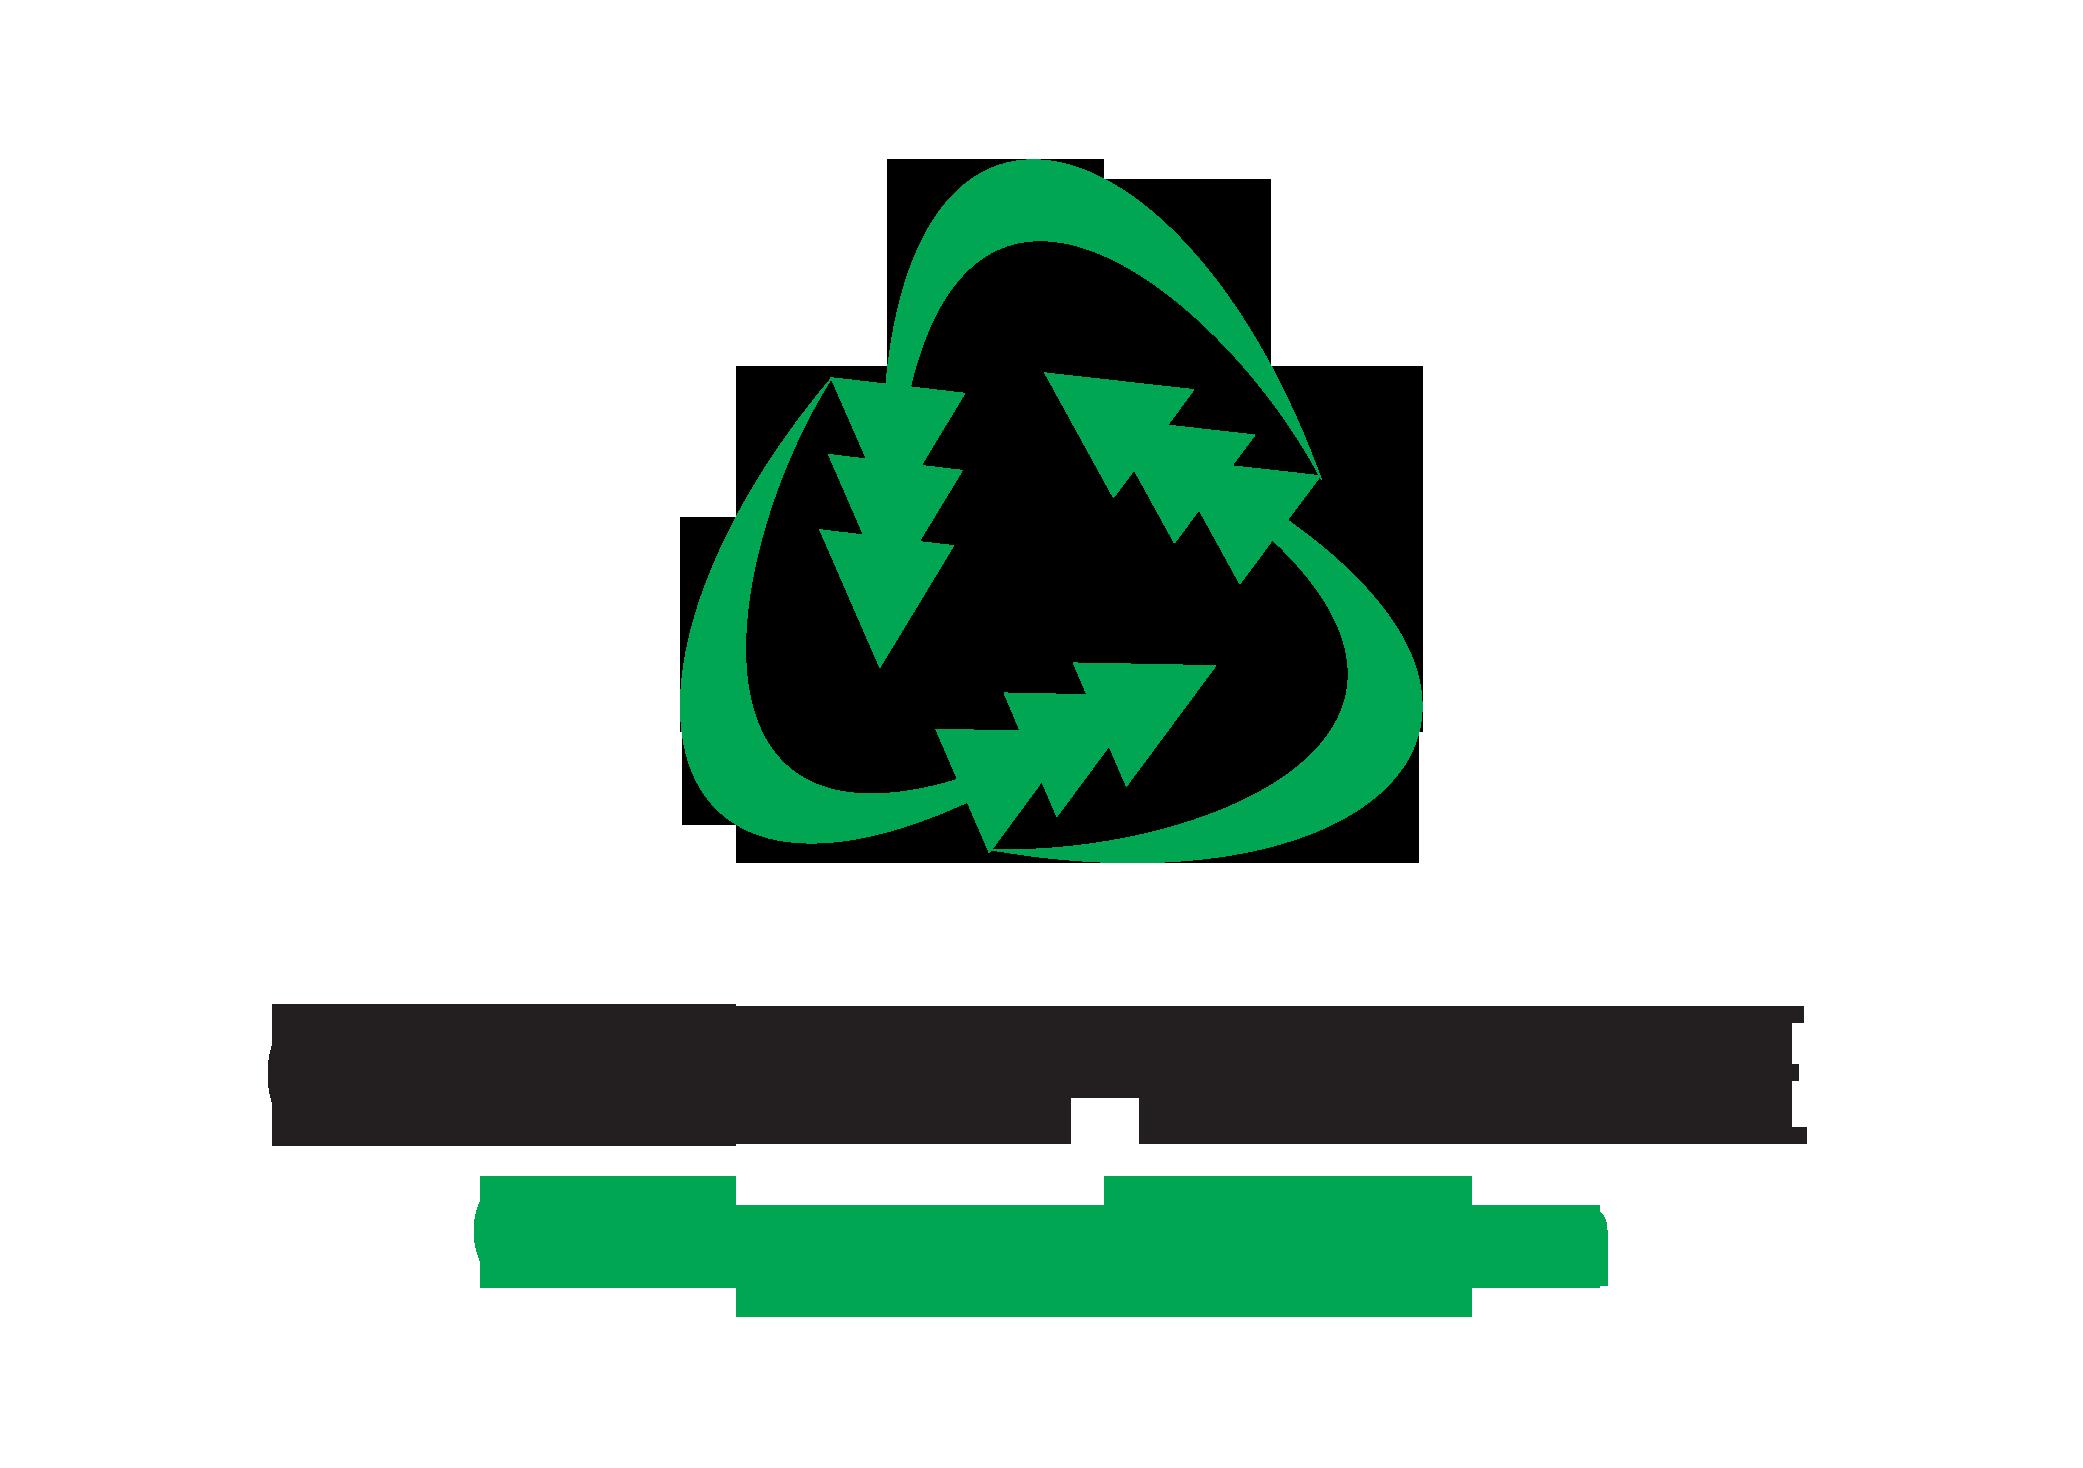 50 free psd company logo designs to download for Company design